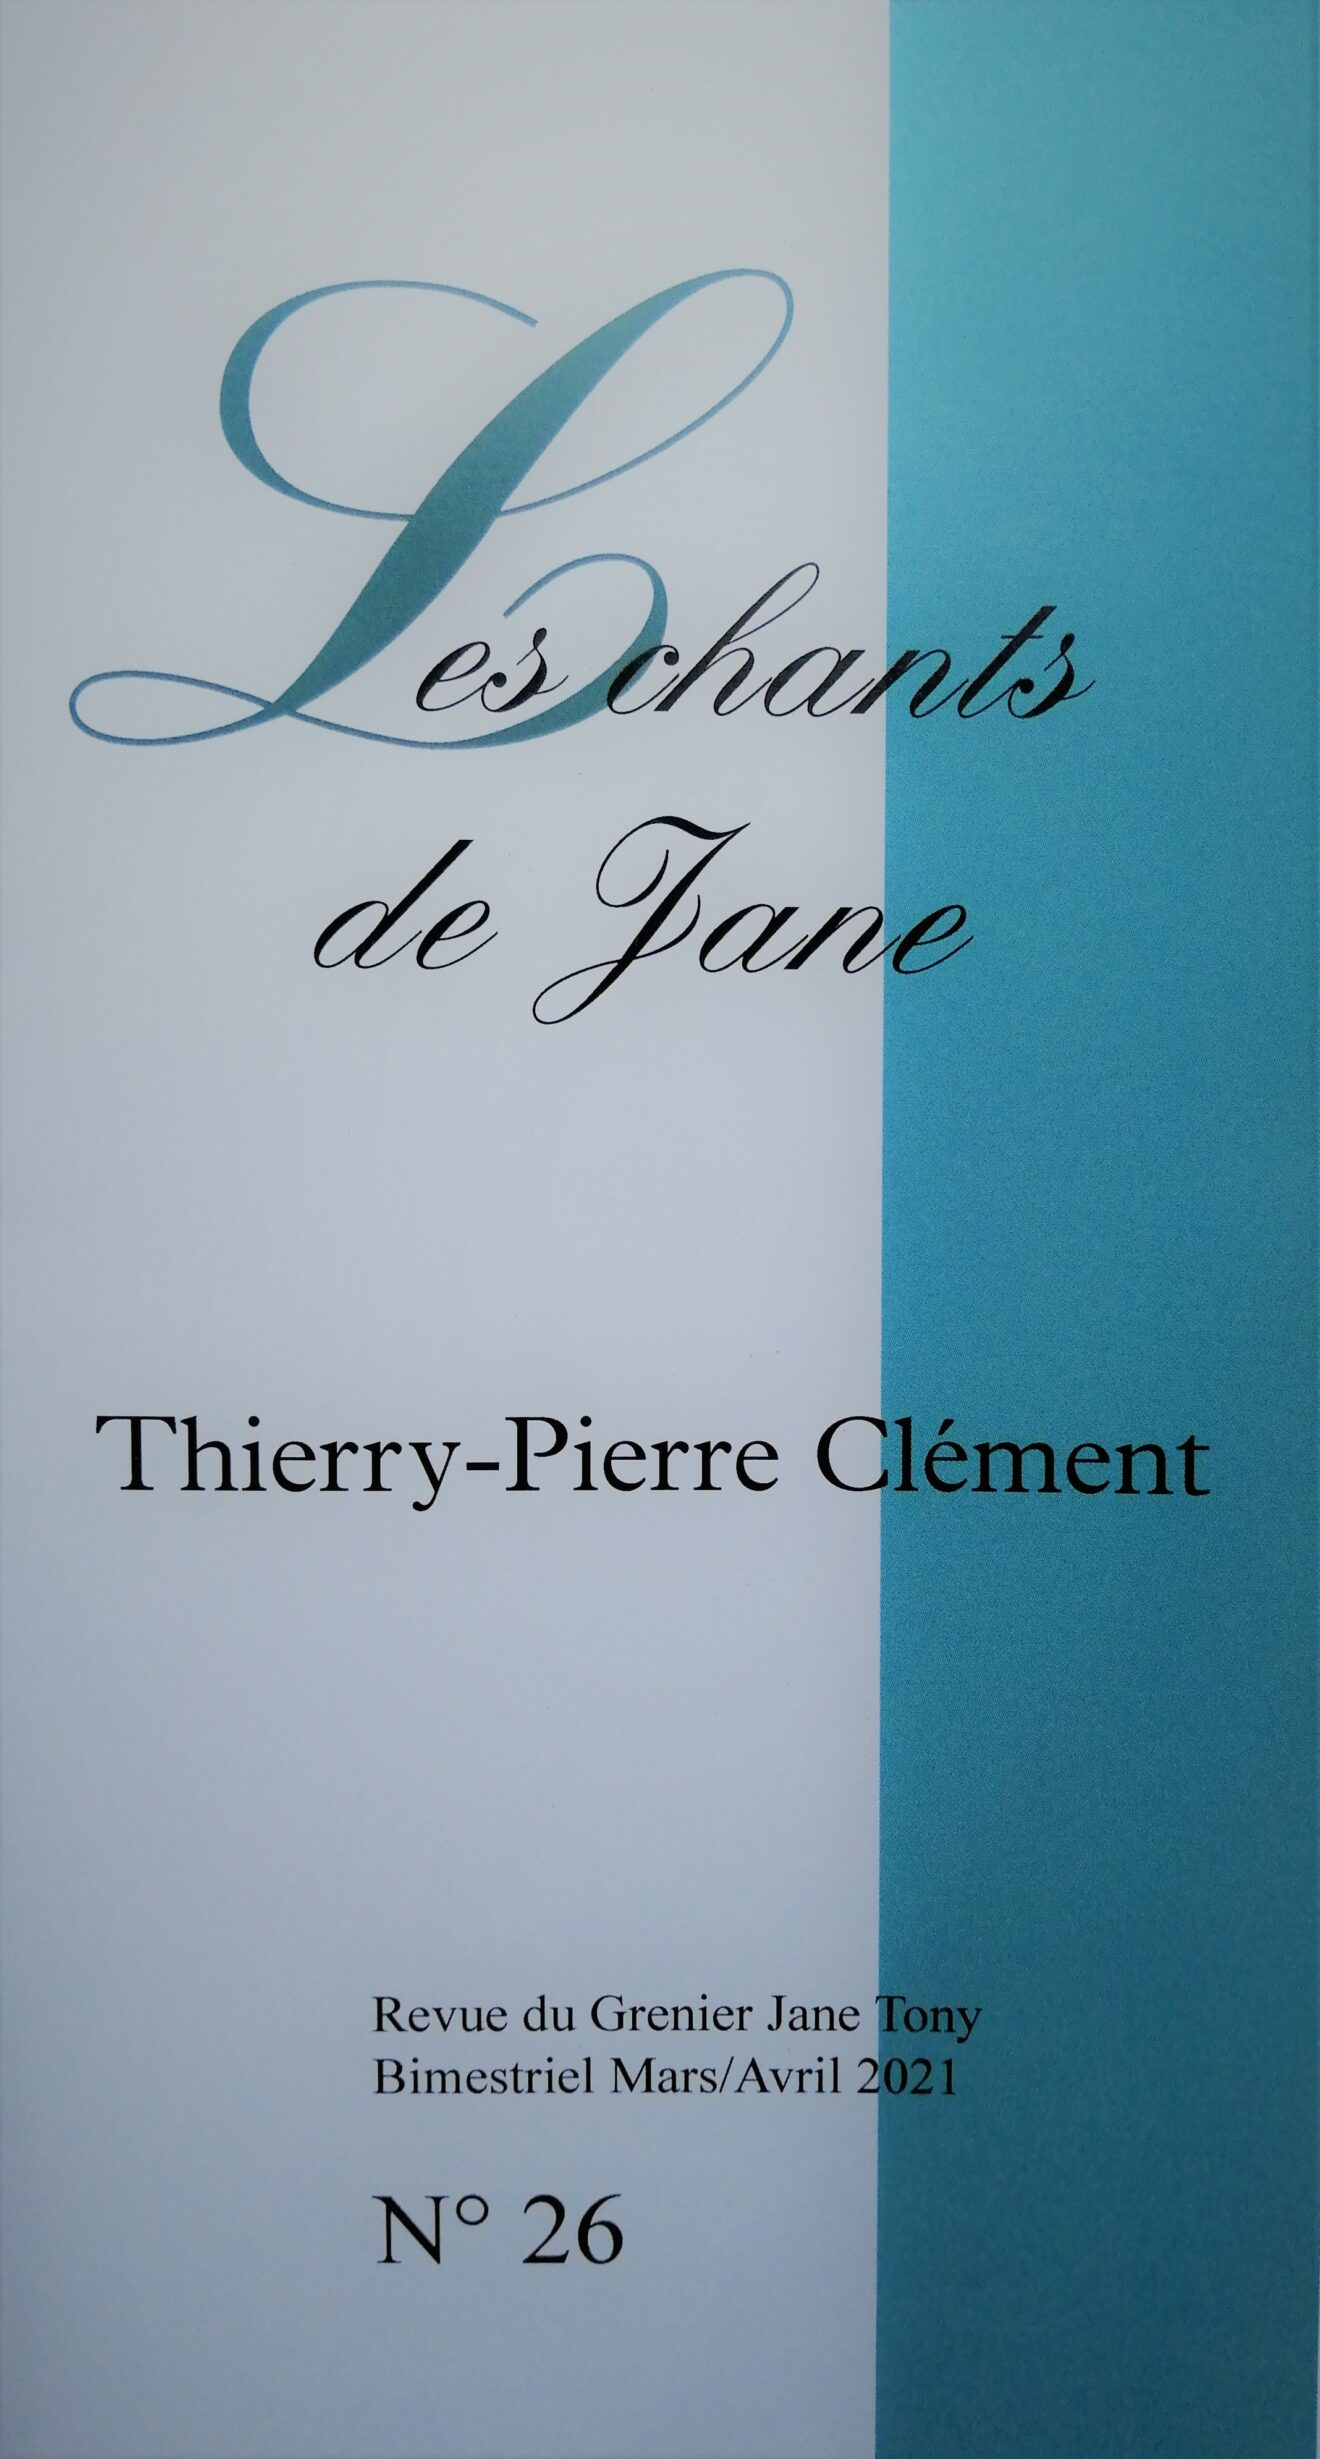 CDJ Clément